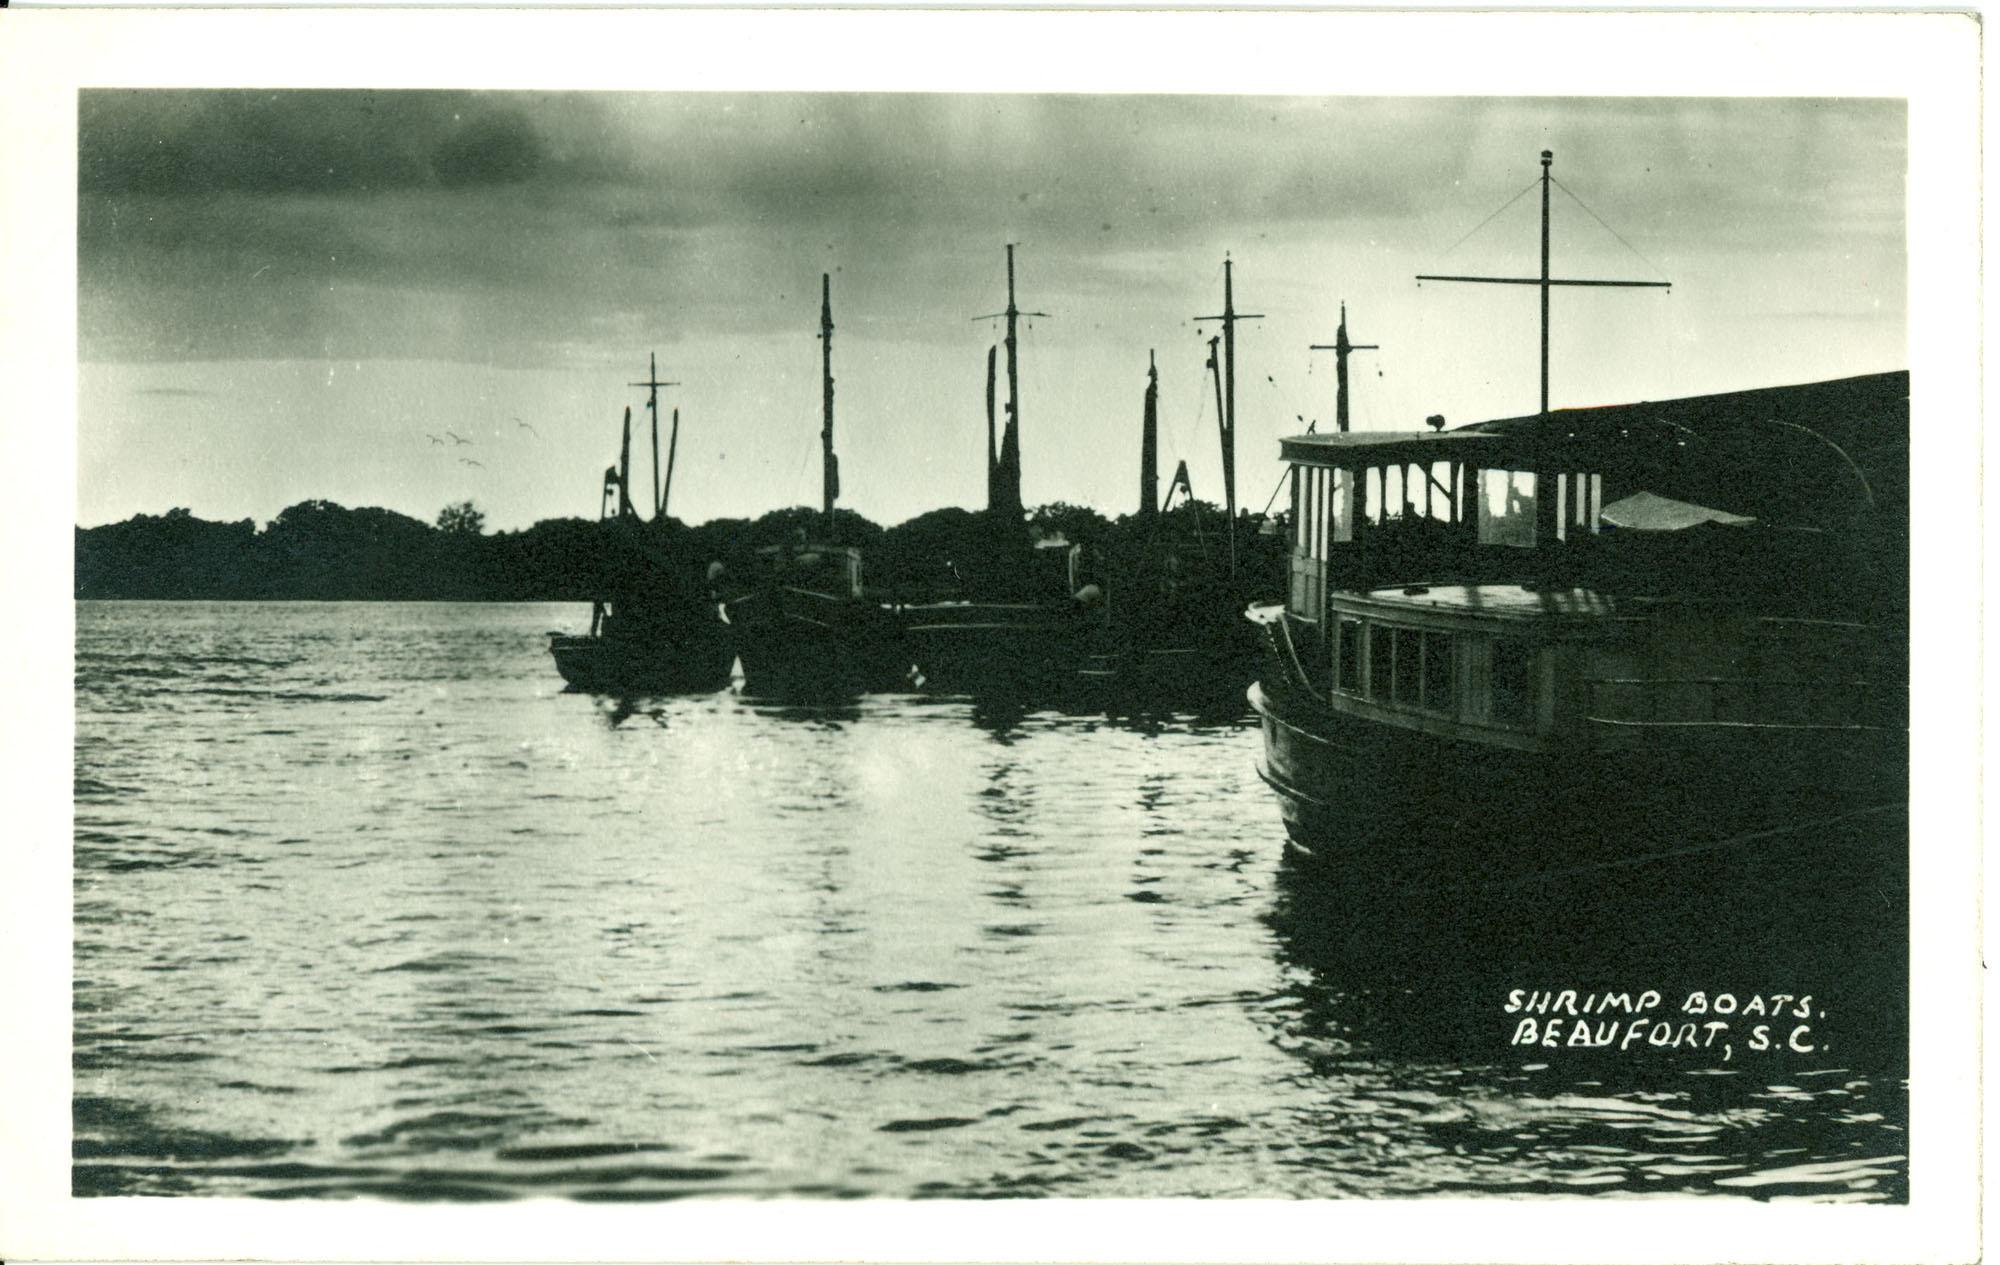 Shrimp Boats. Beaufort, S.C.